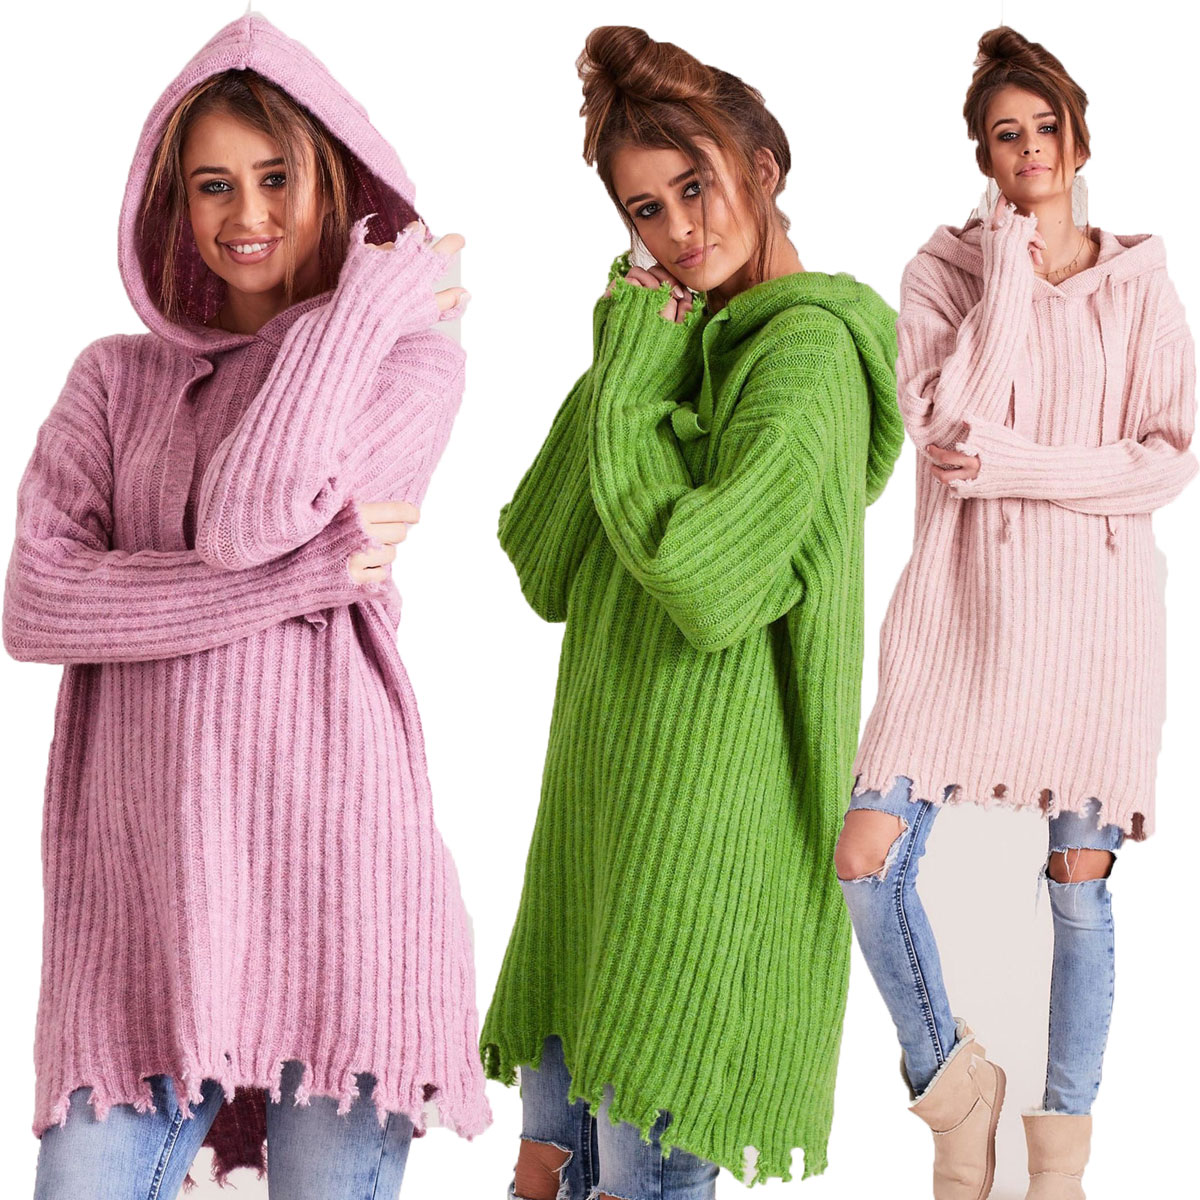 Teplý pletený svetr s kapucí - vlna a moher JK14 HANNA - fashionweek ... cb1bf4587a